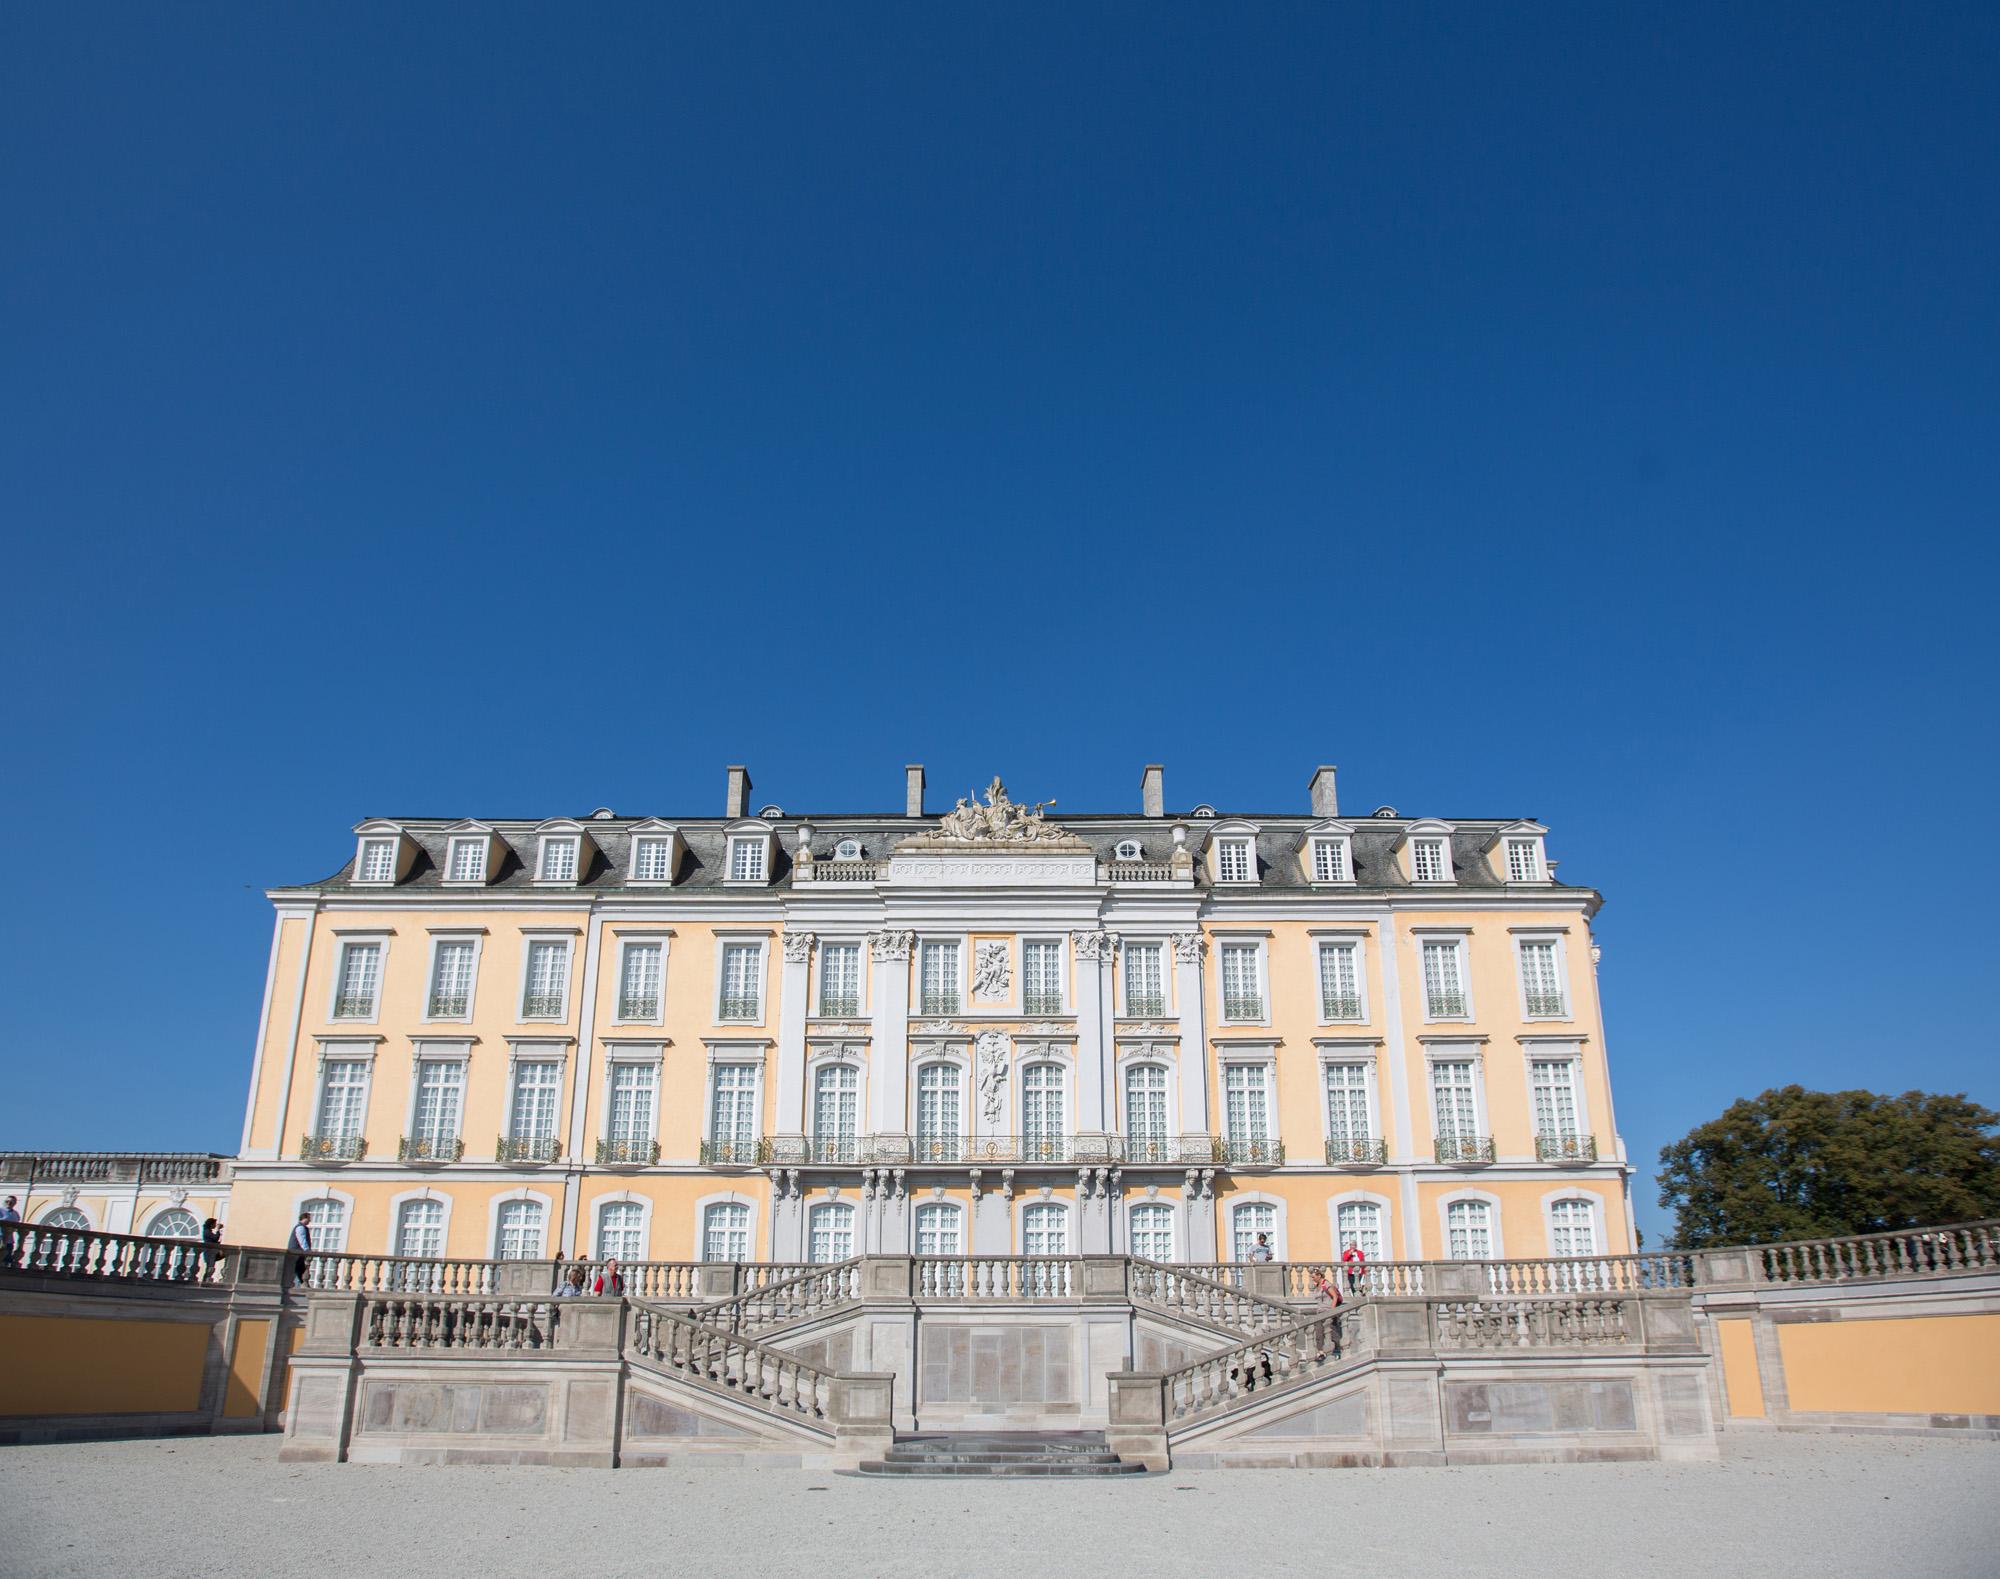 Hochzeit-Schloss-Bruehl_01.jpg